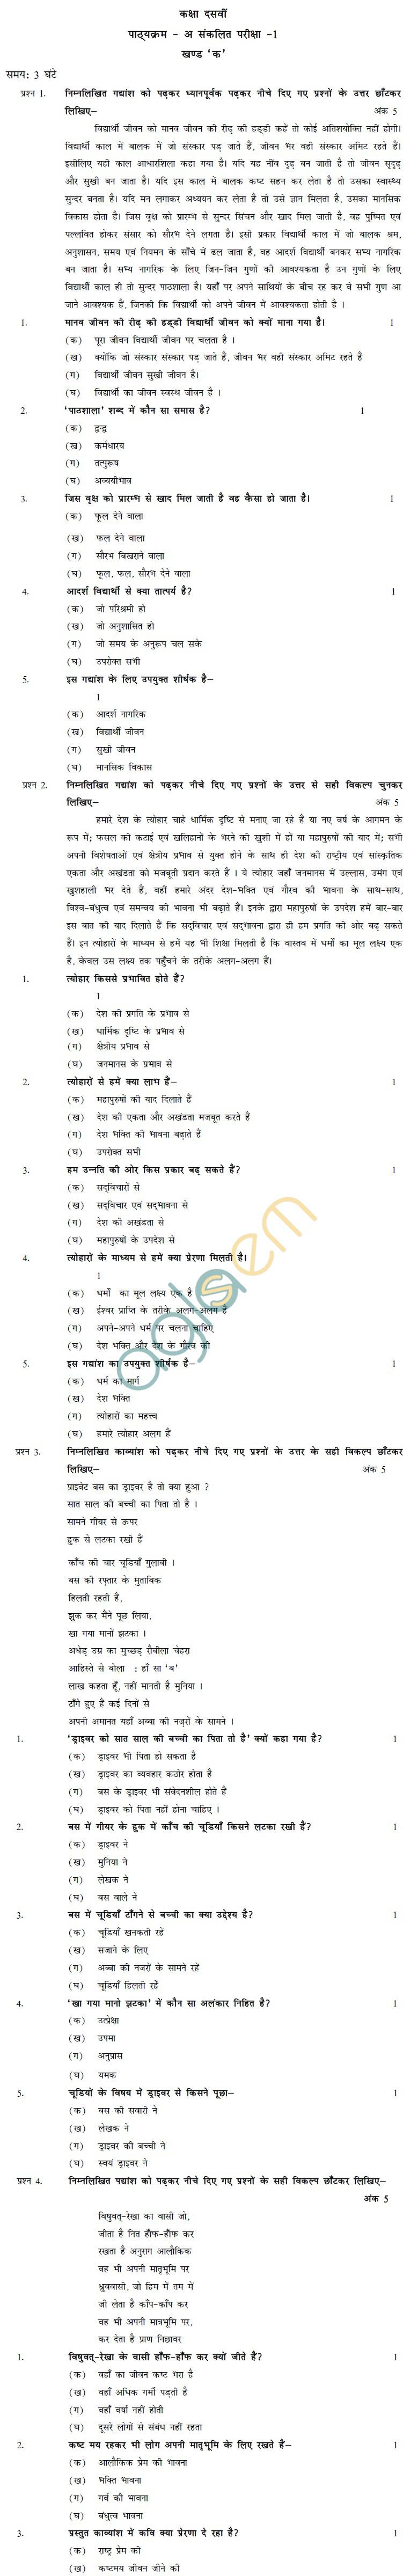 CBSE Board Exam 2013 Sample Papers (SA1) Class X - Hindi A